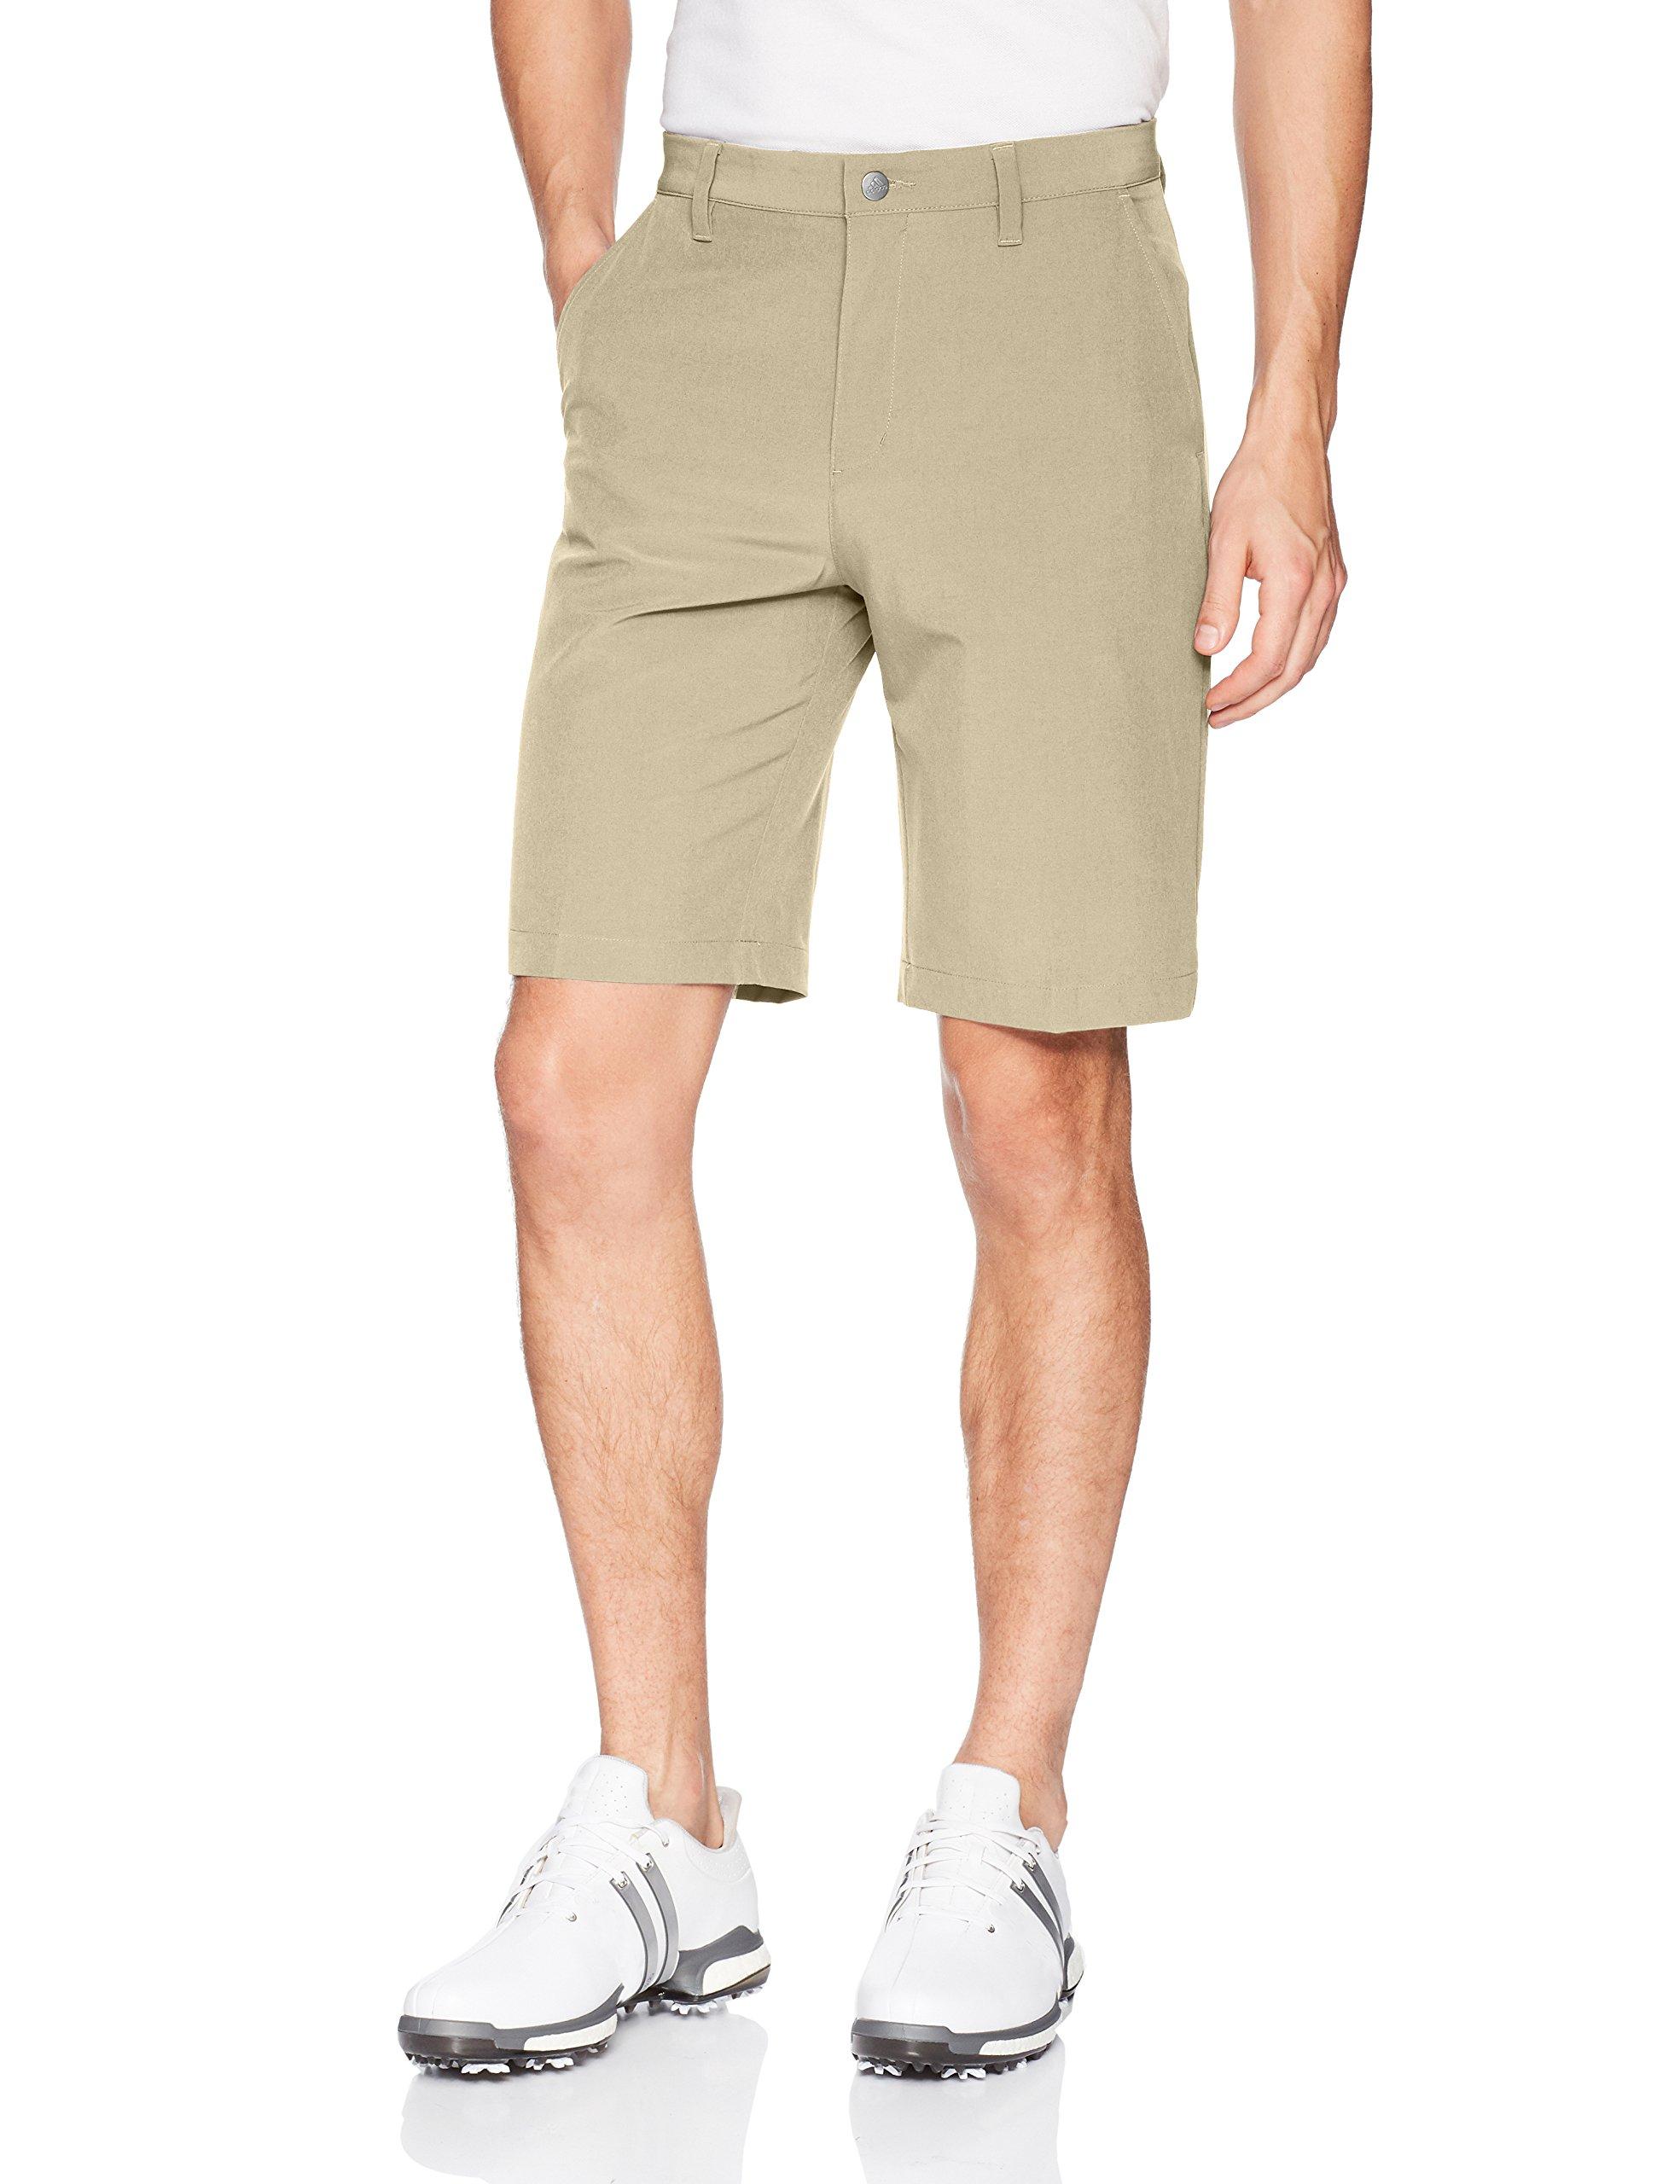 adidas Golf Ultimate 365 Short, Raw Gold, 34'' by adidas